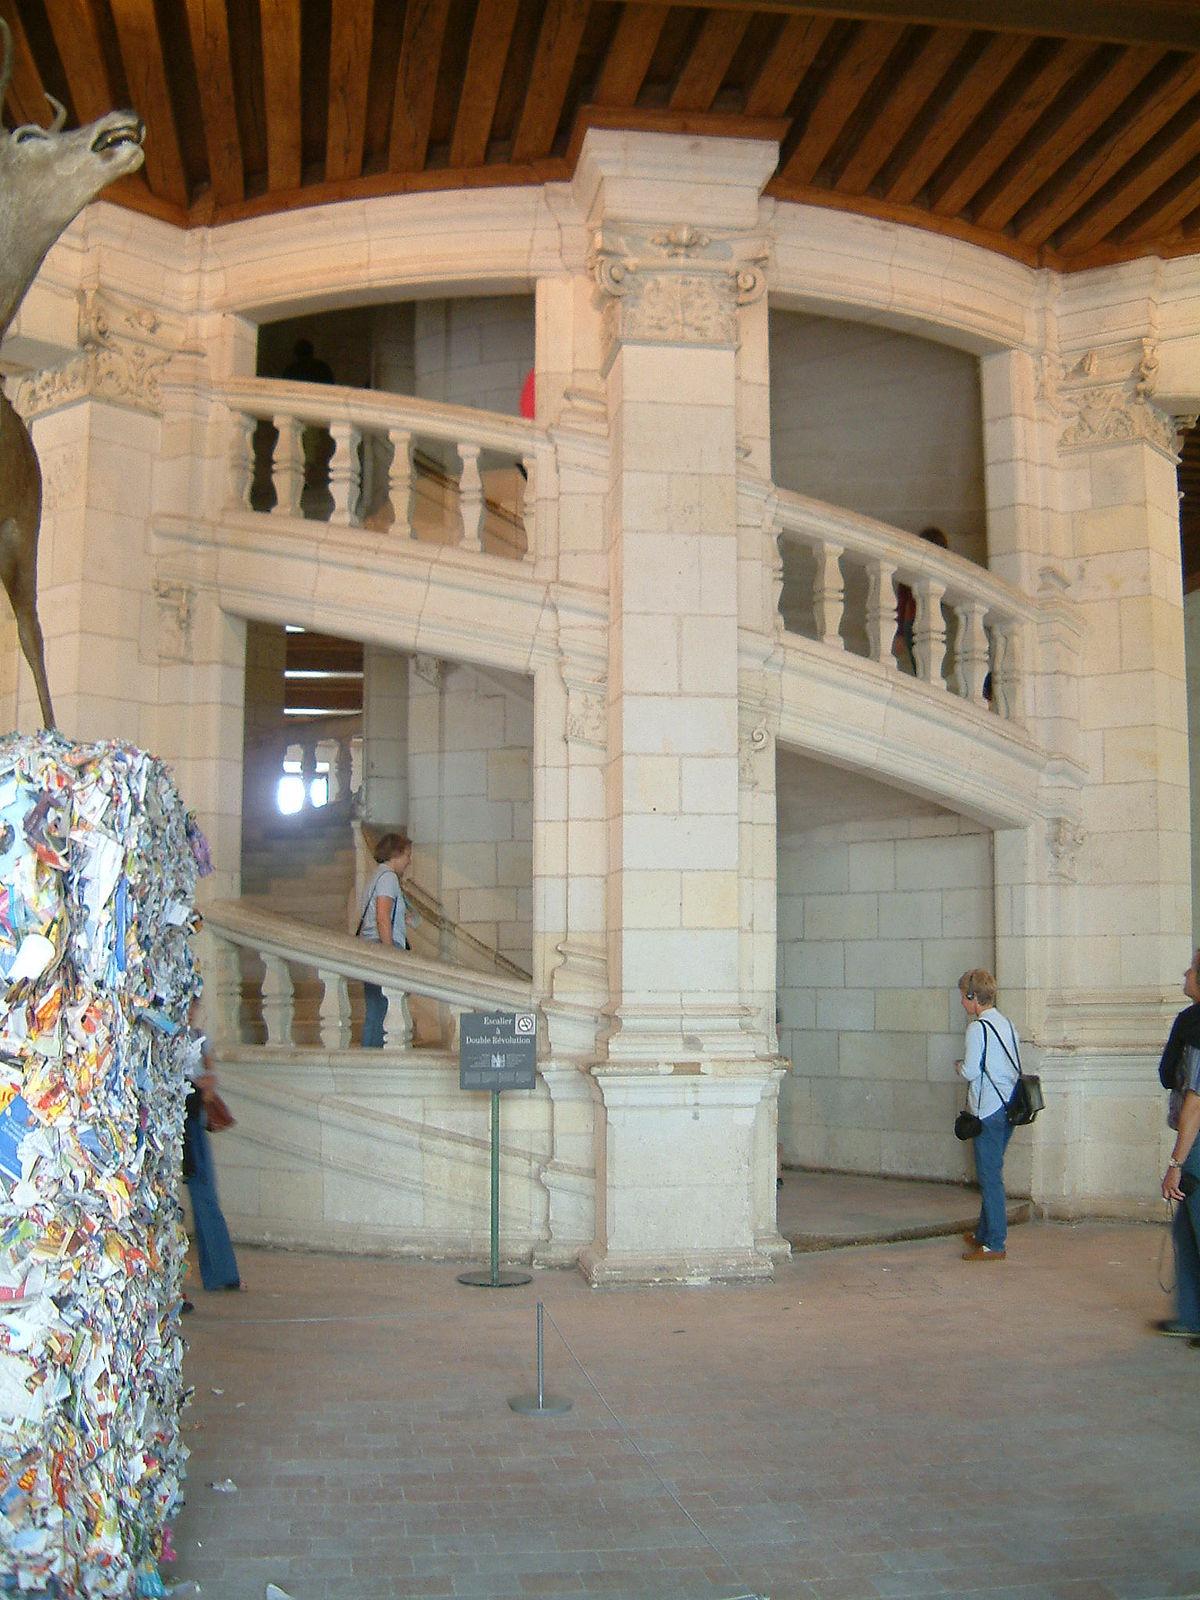 Escalier double helice Chambord.jpg